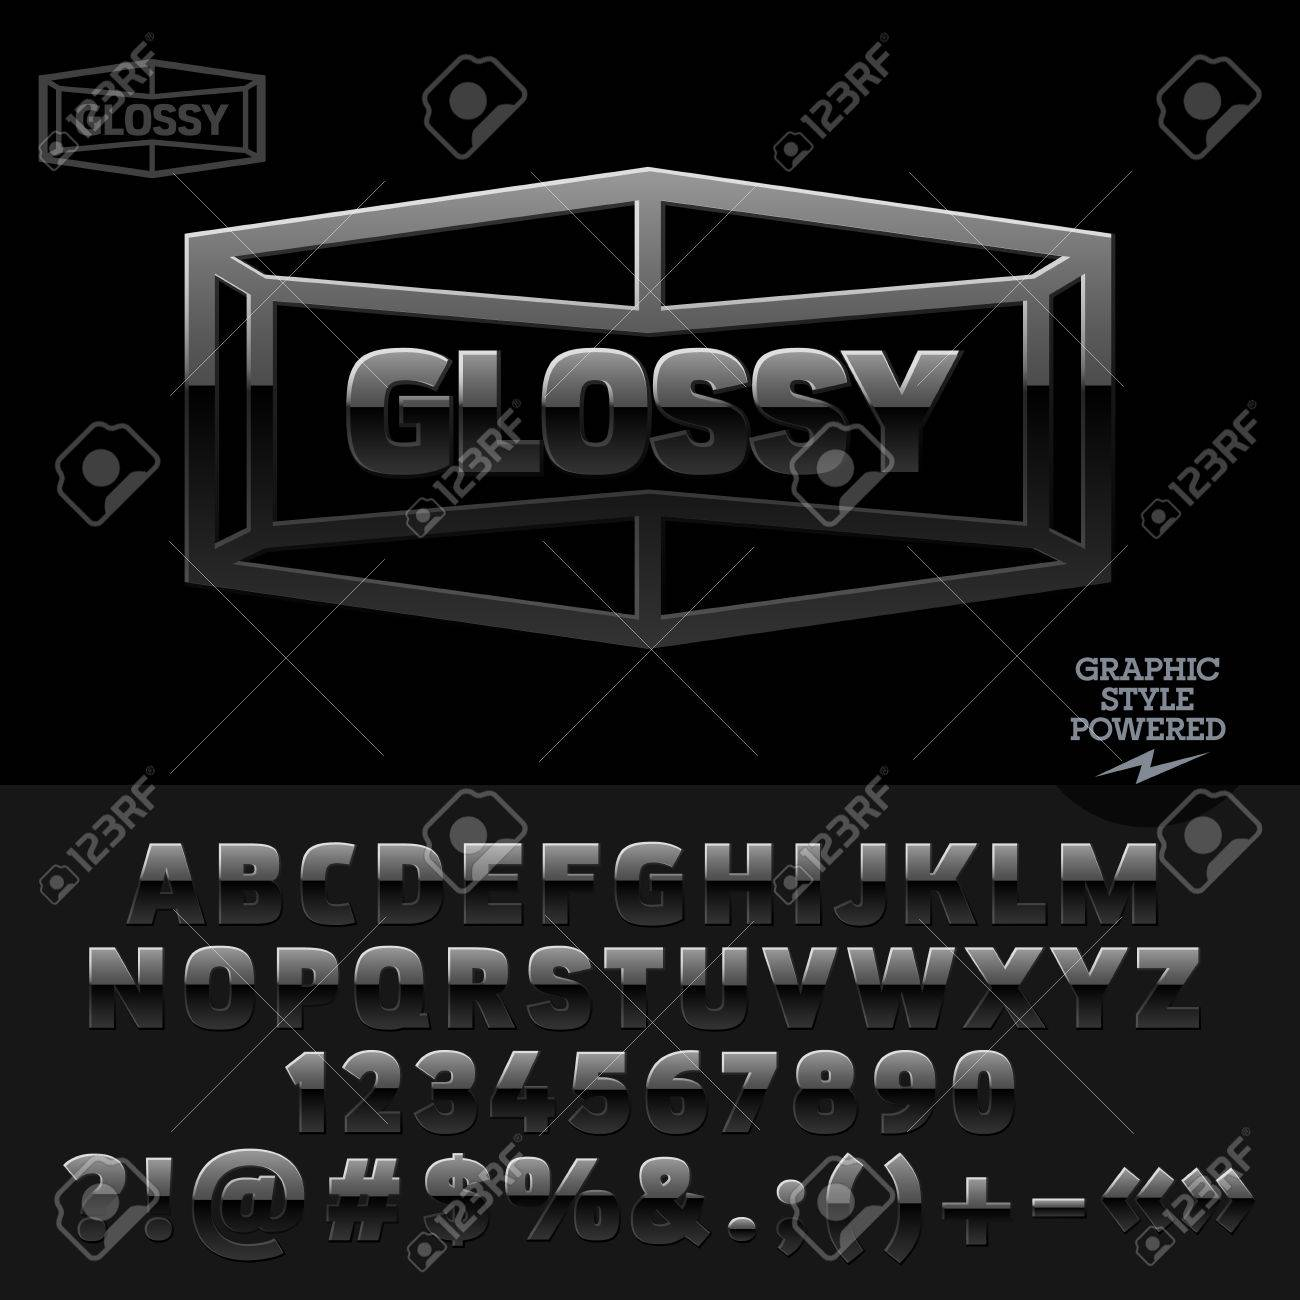 Glossy Black Plastic Emblem For Luxury Car Shop Vector Set Of